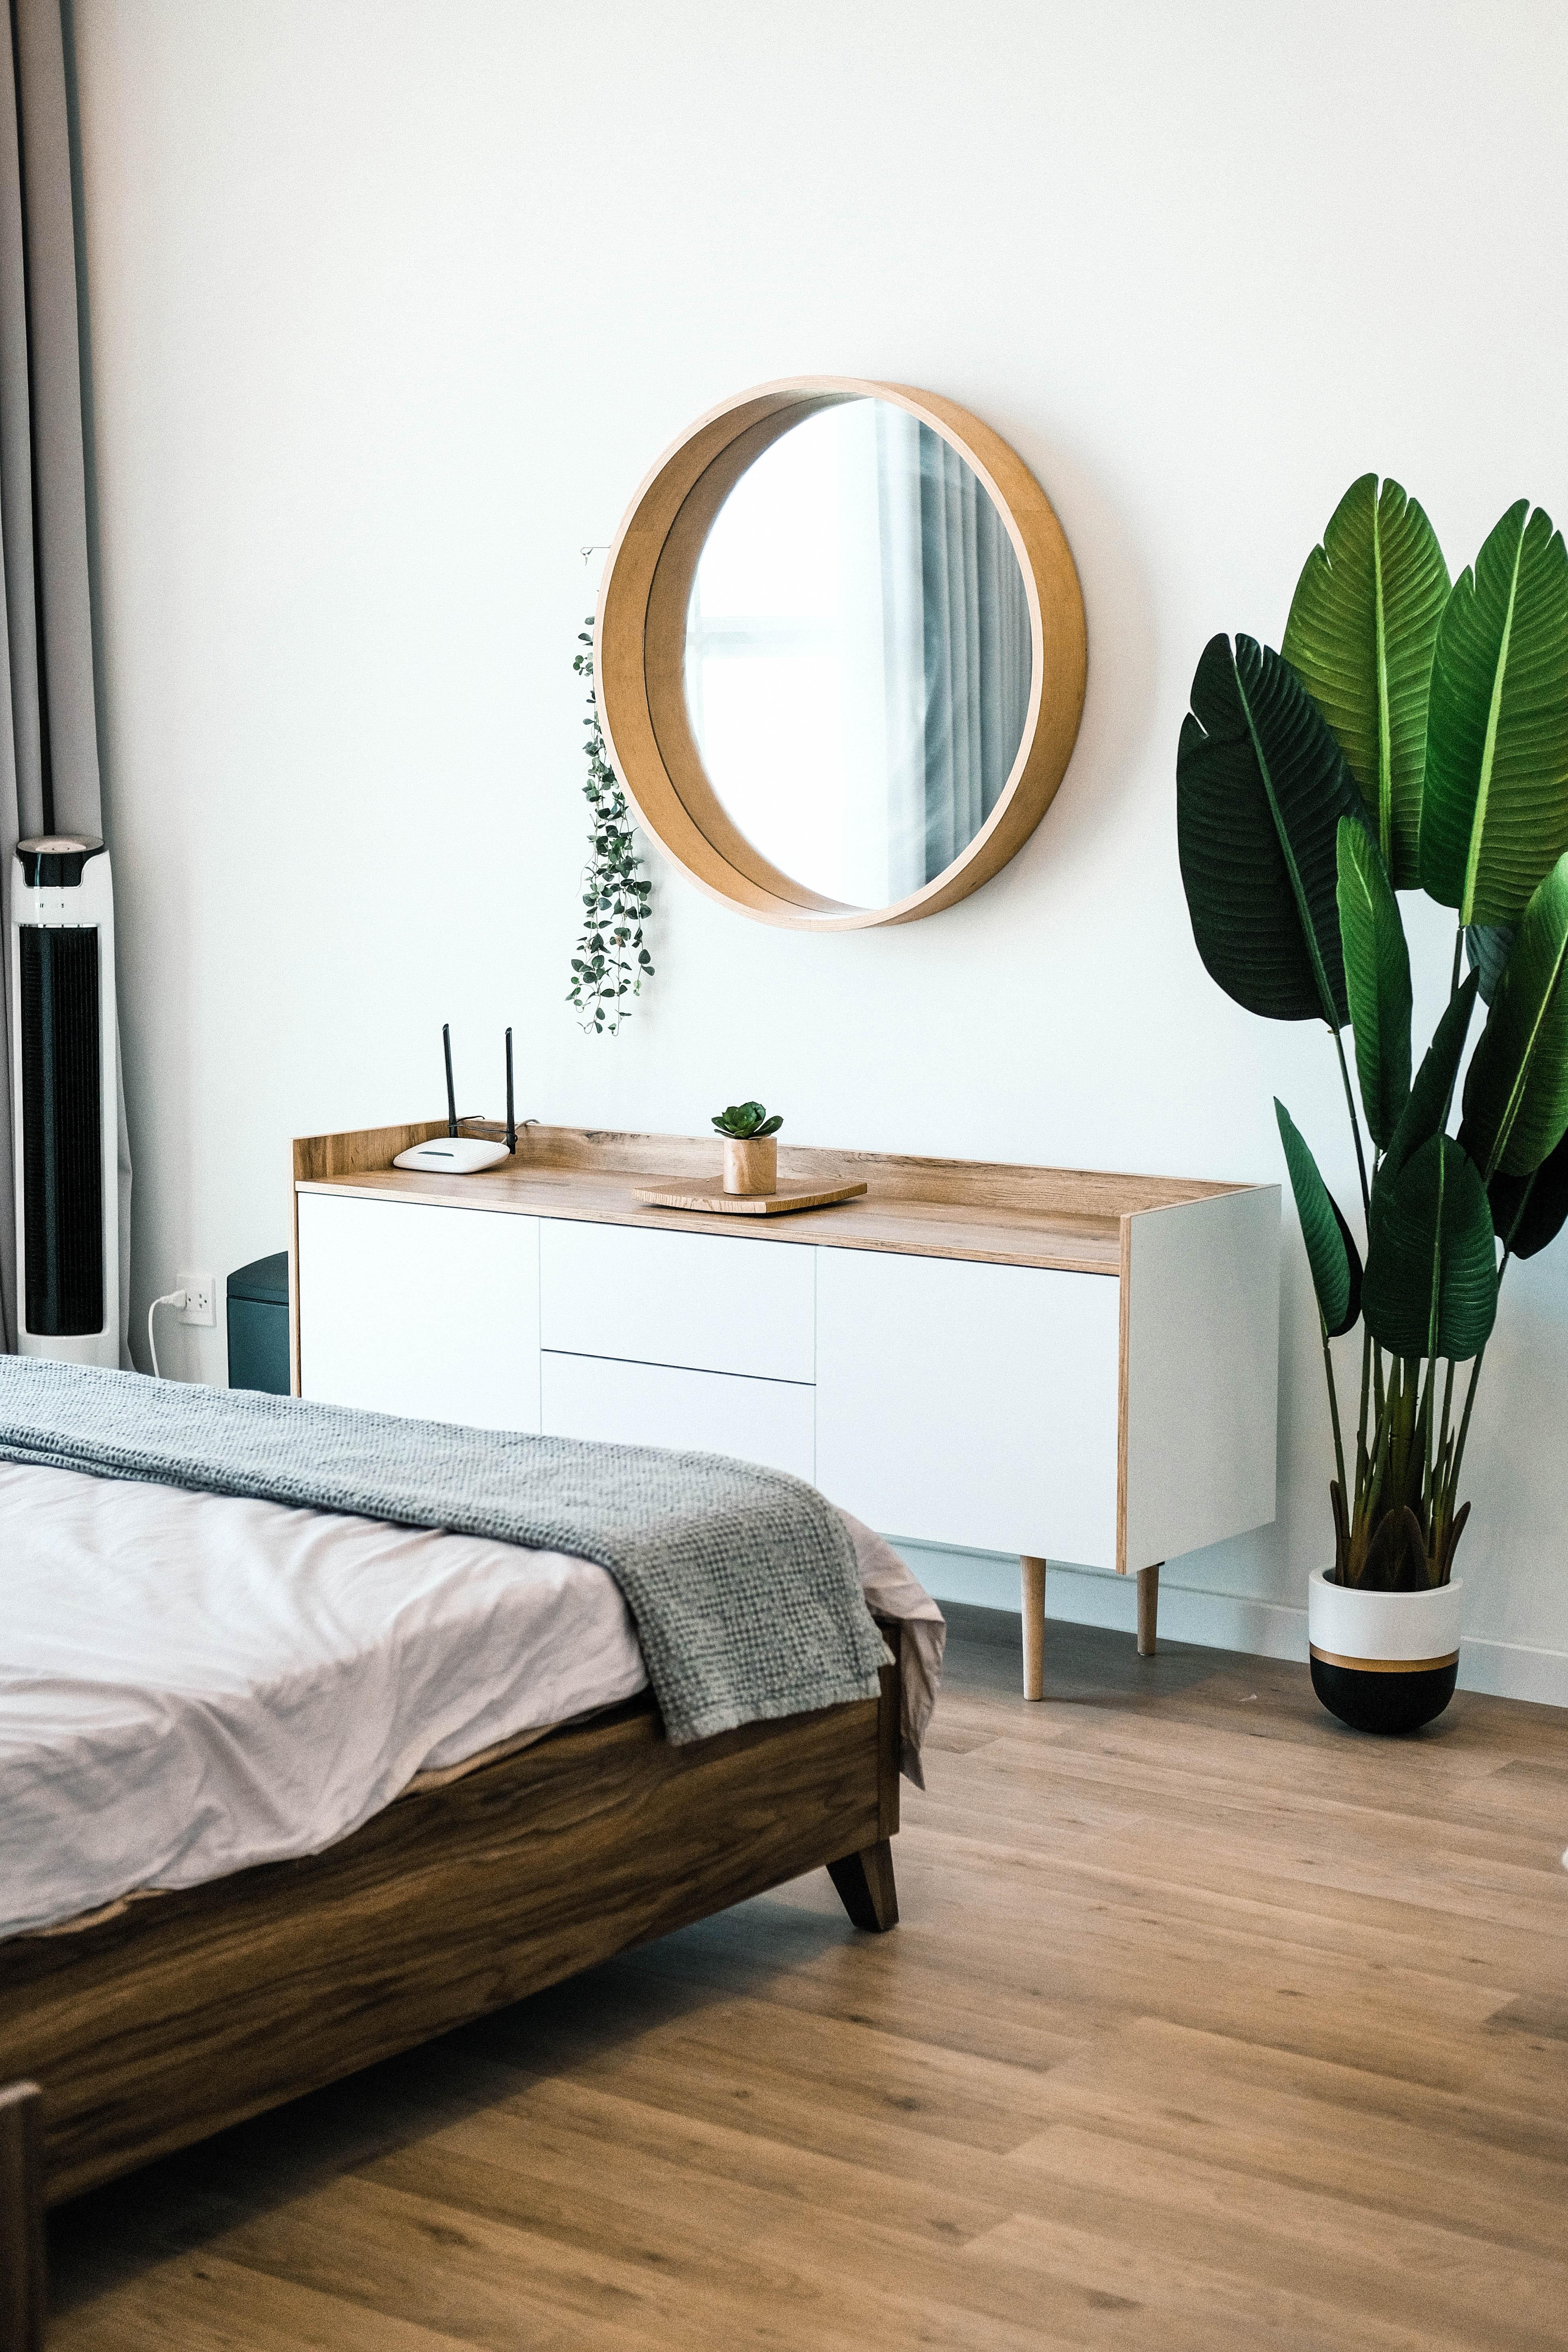 sabeeapp apartment management system